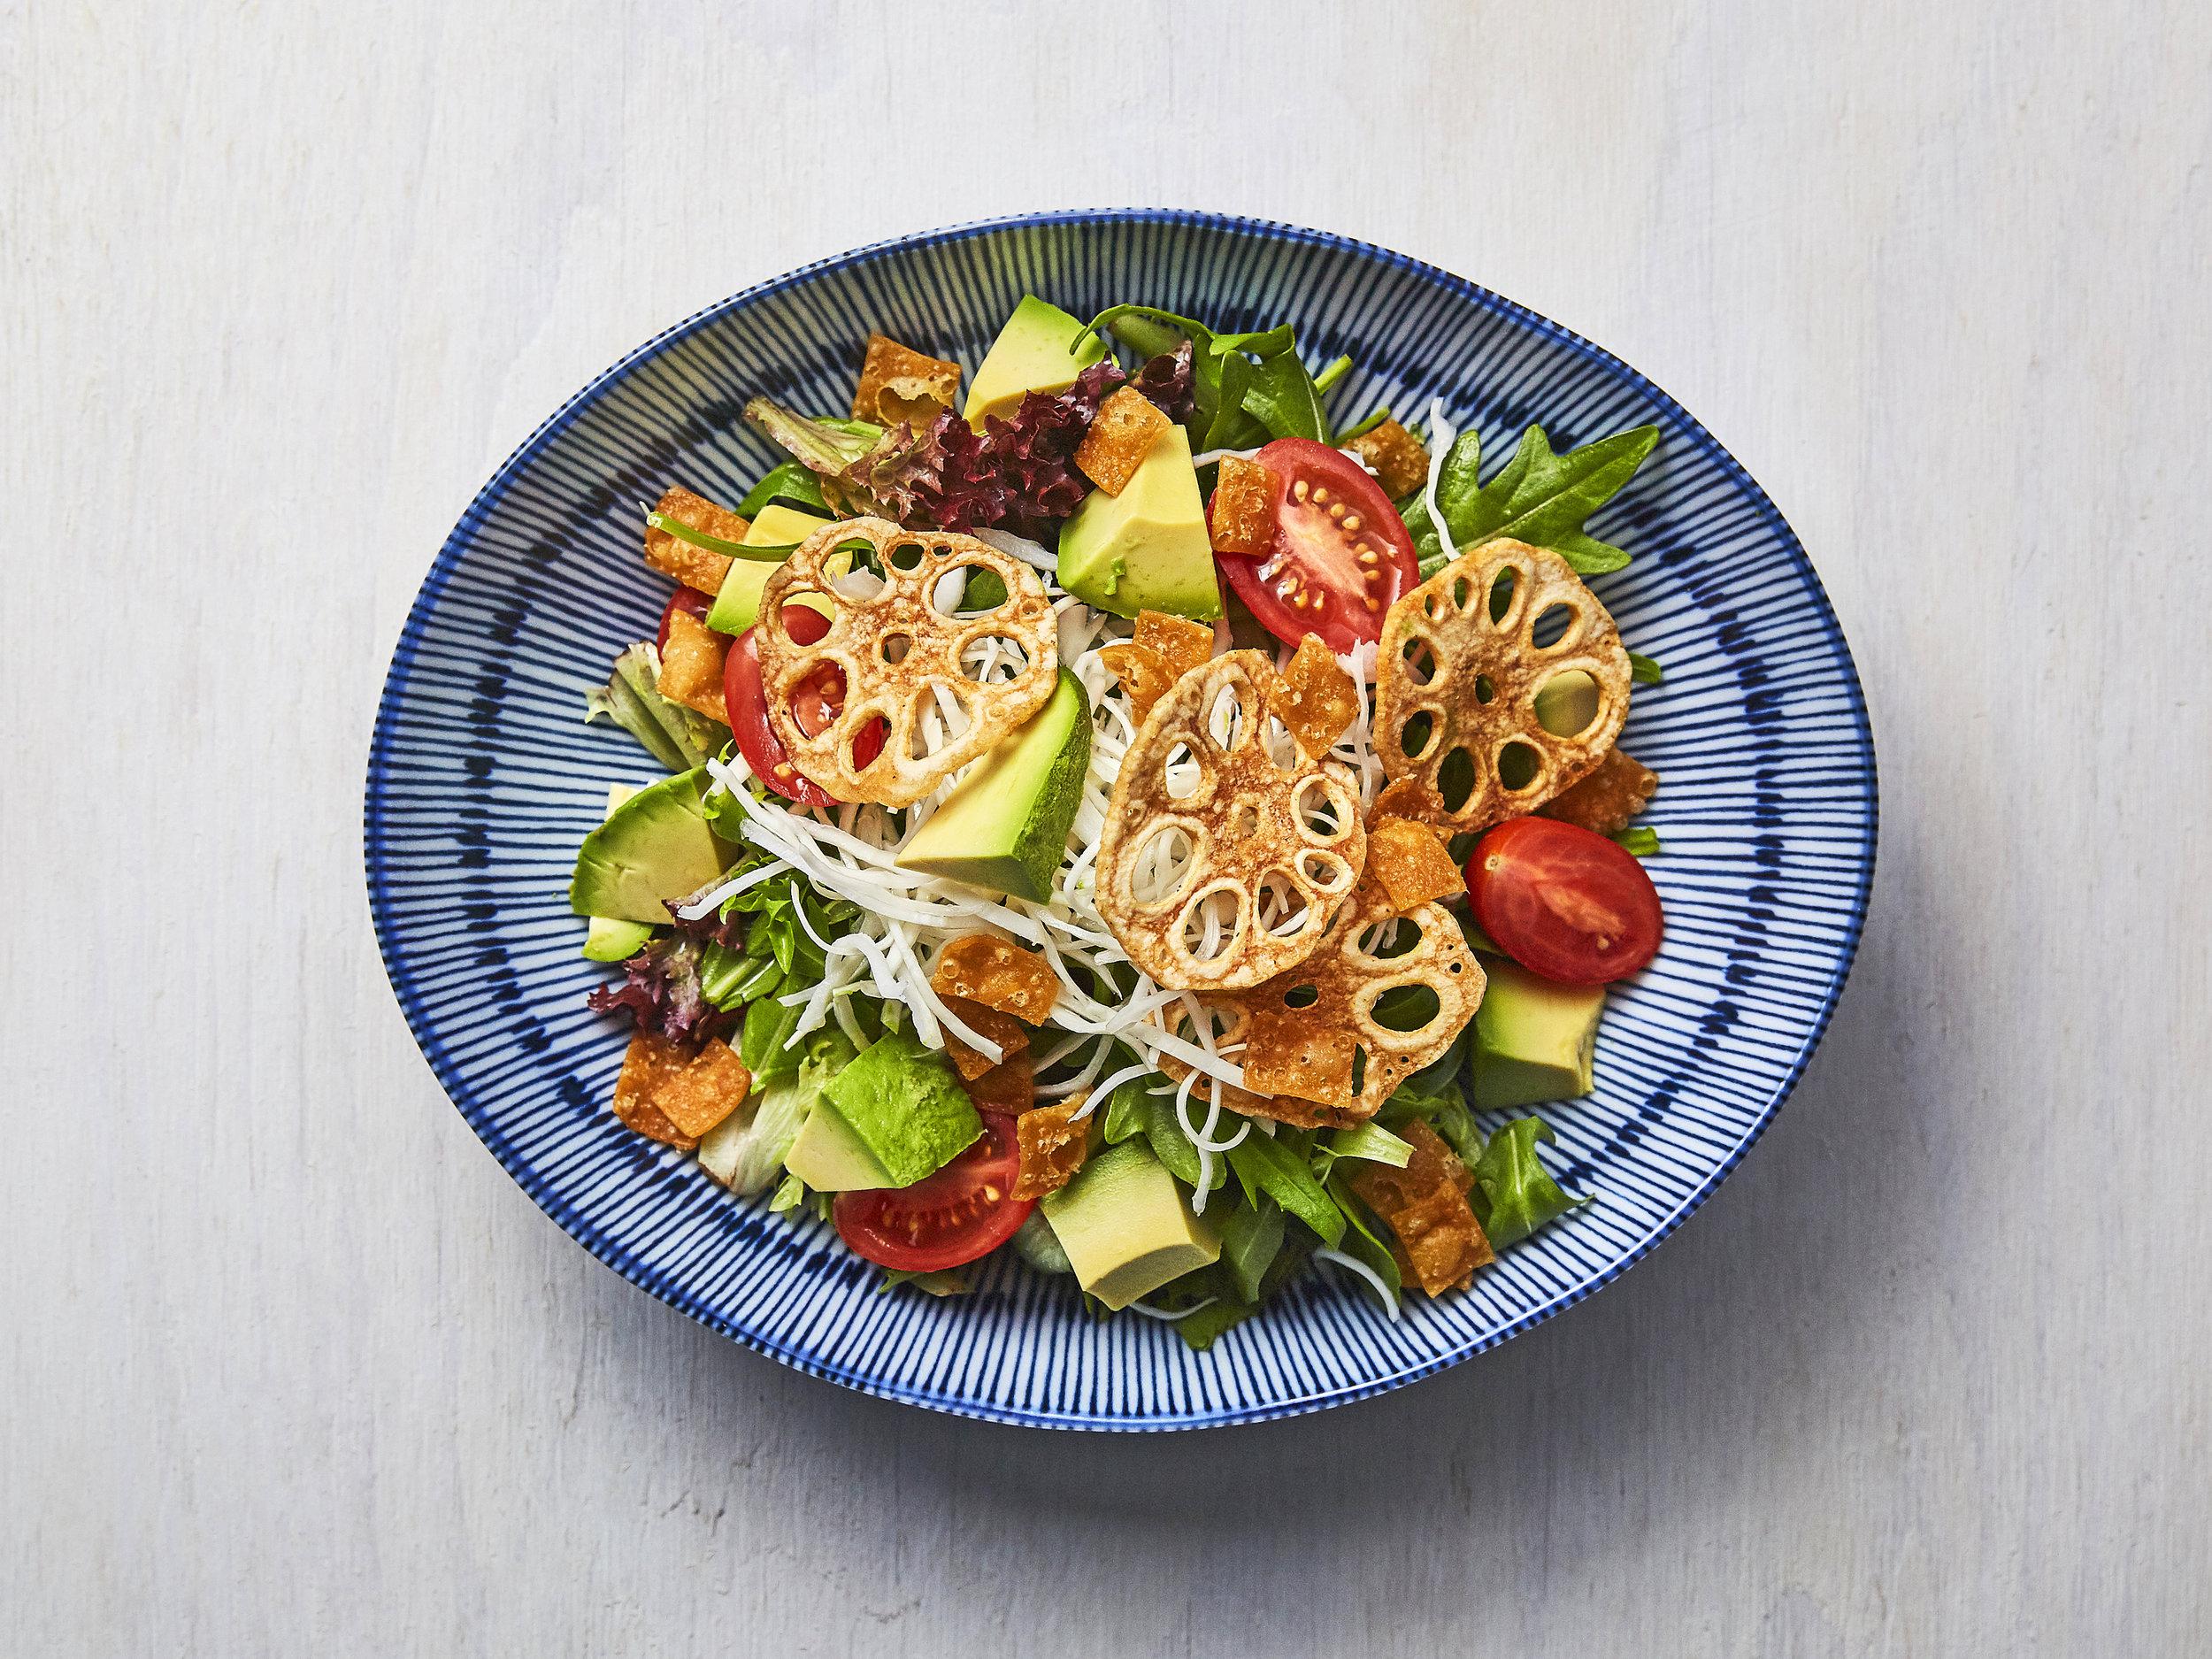 Crunchy Mixed Salad